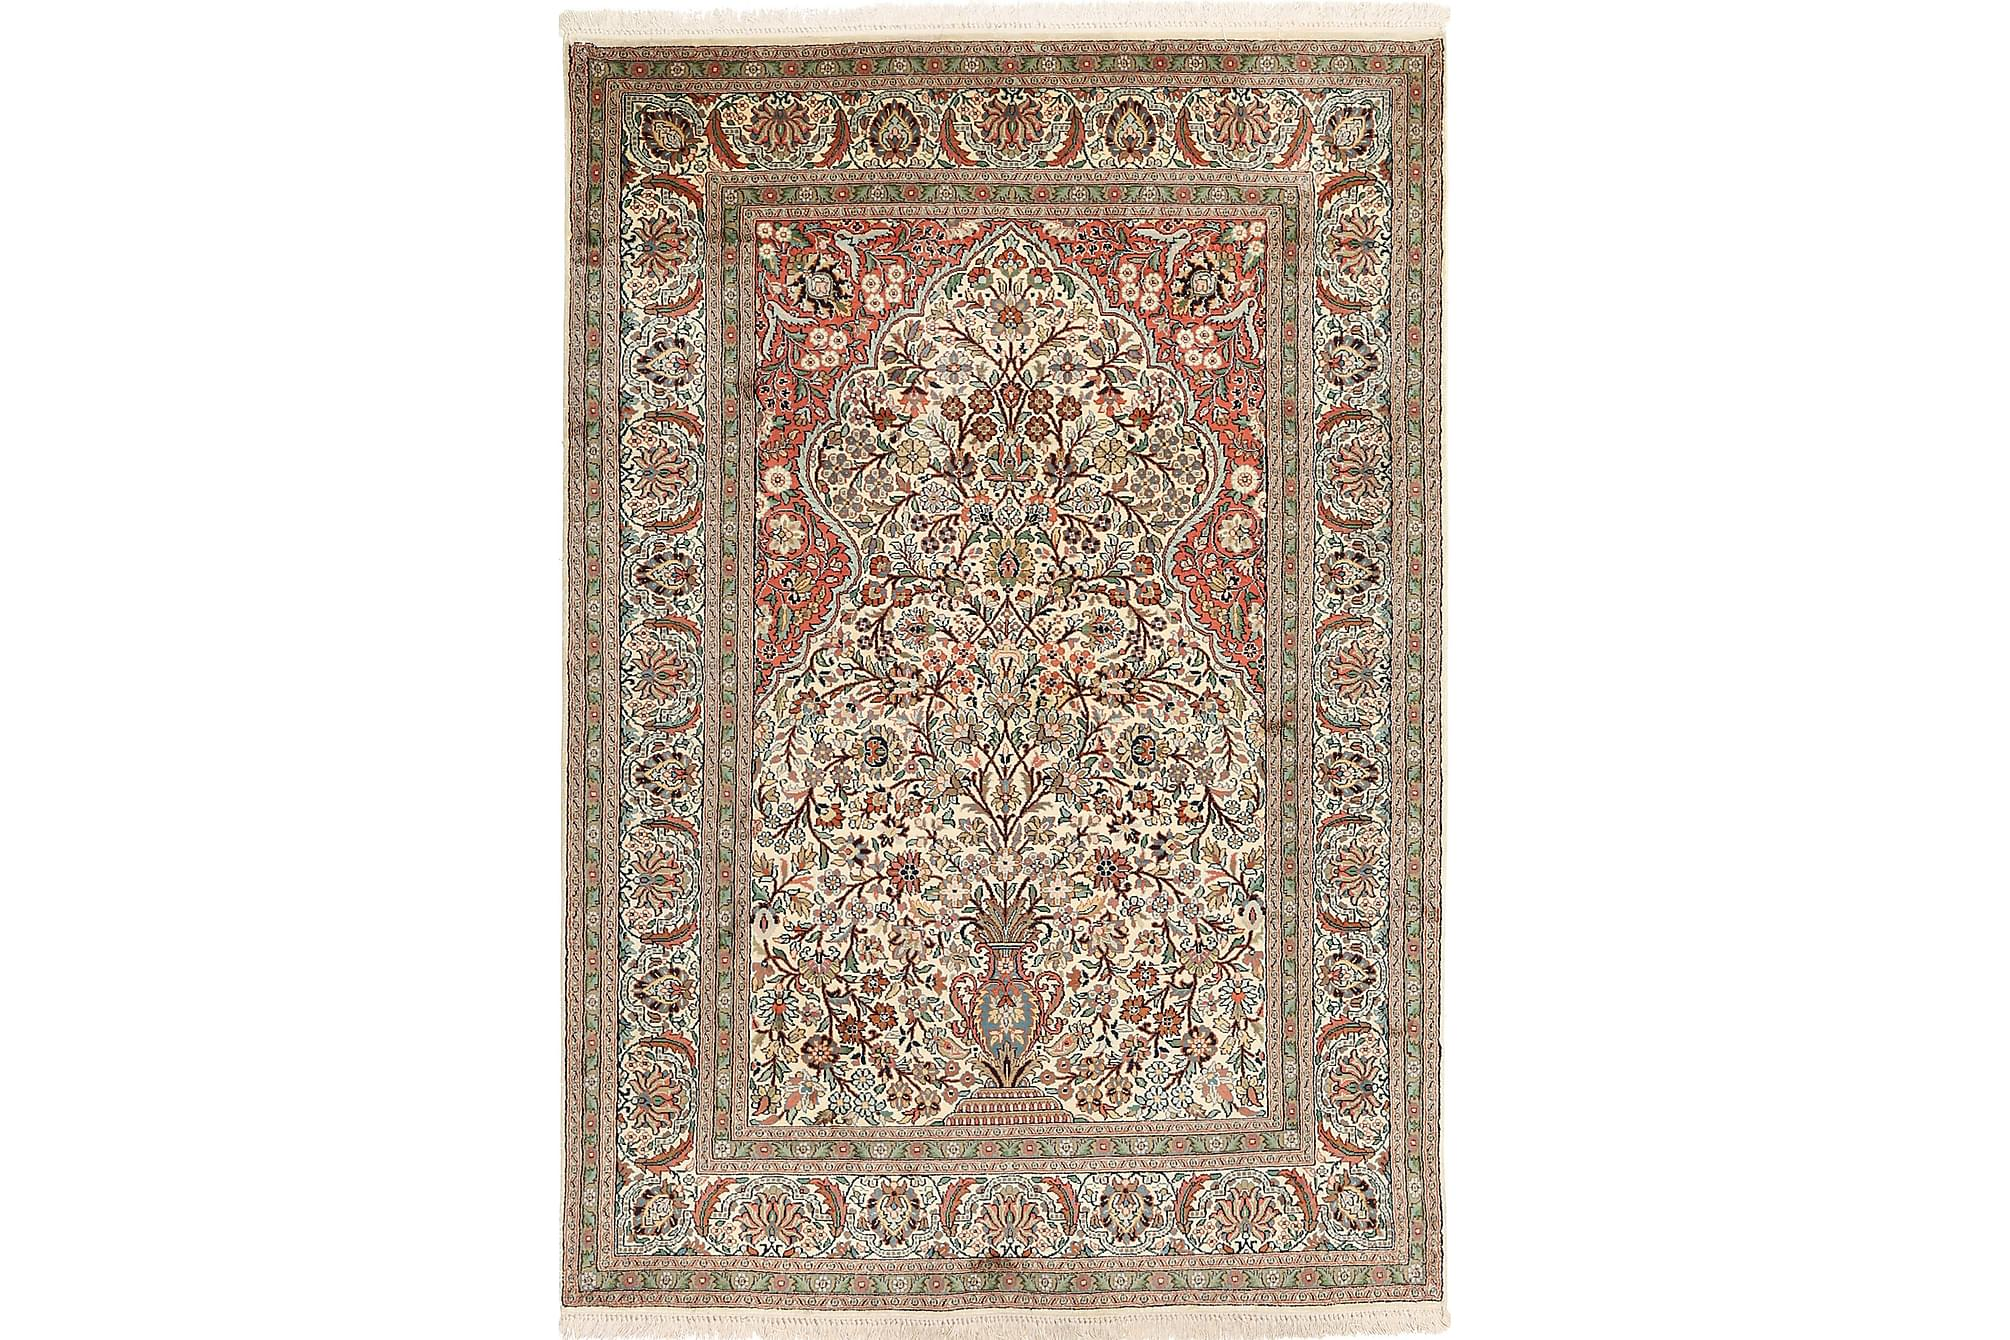 Orientalisk Silkesmatta Kashmir 123x179, Äkta silkesmattor